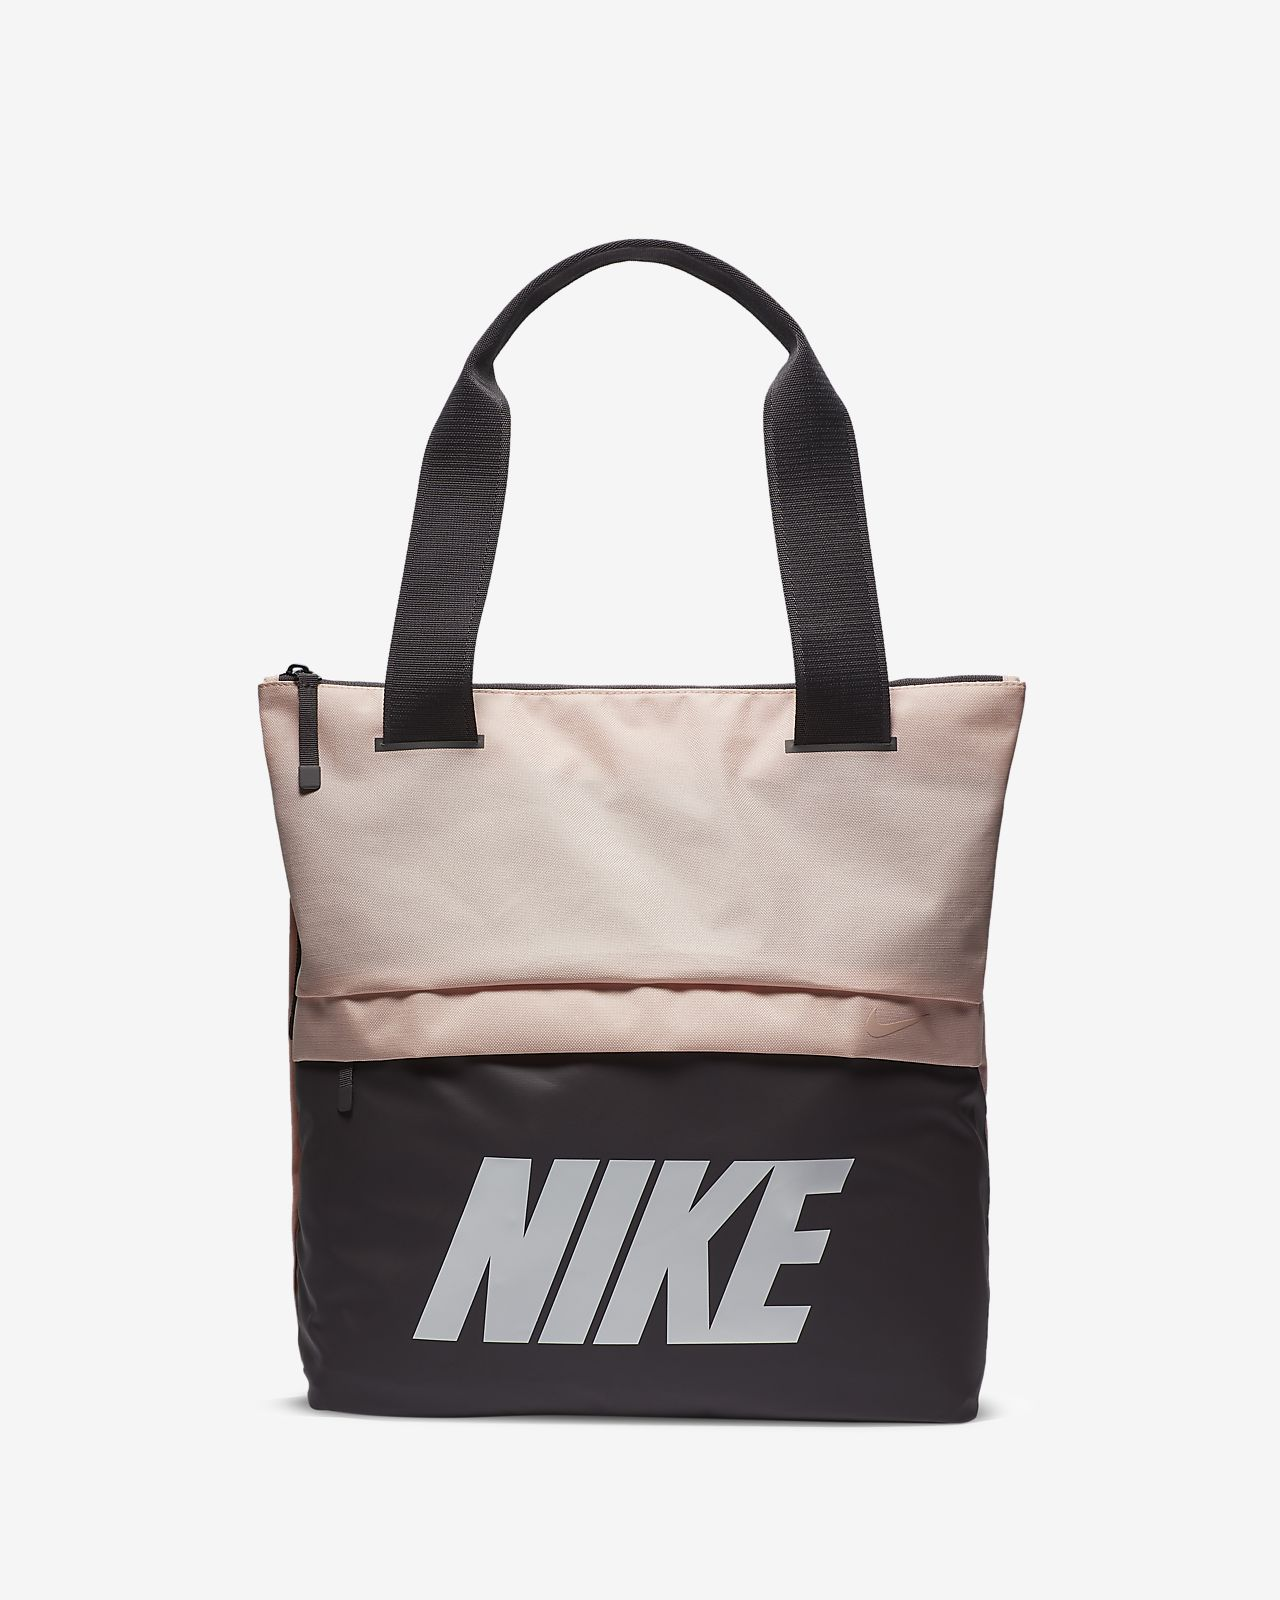 f27aeffd53227 Nike Radiate Women s Training Graphic Tote Bag. Nike.com ZA